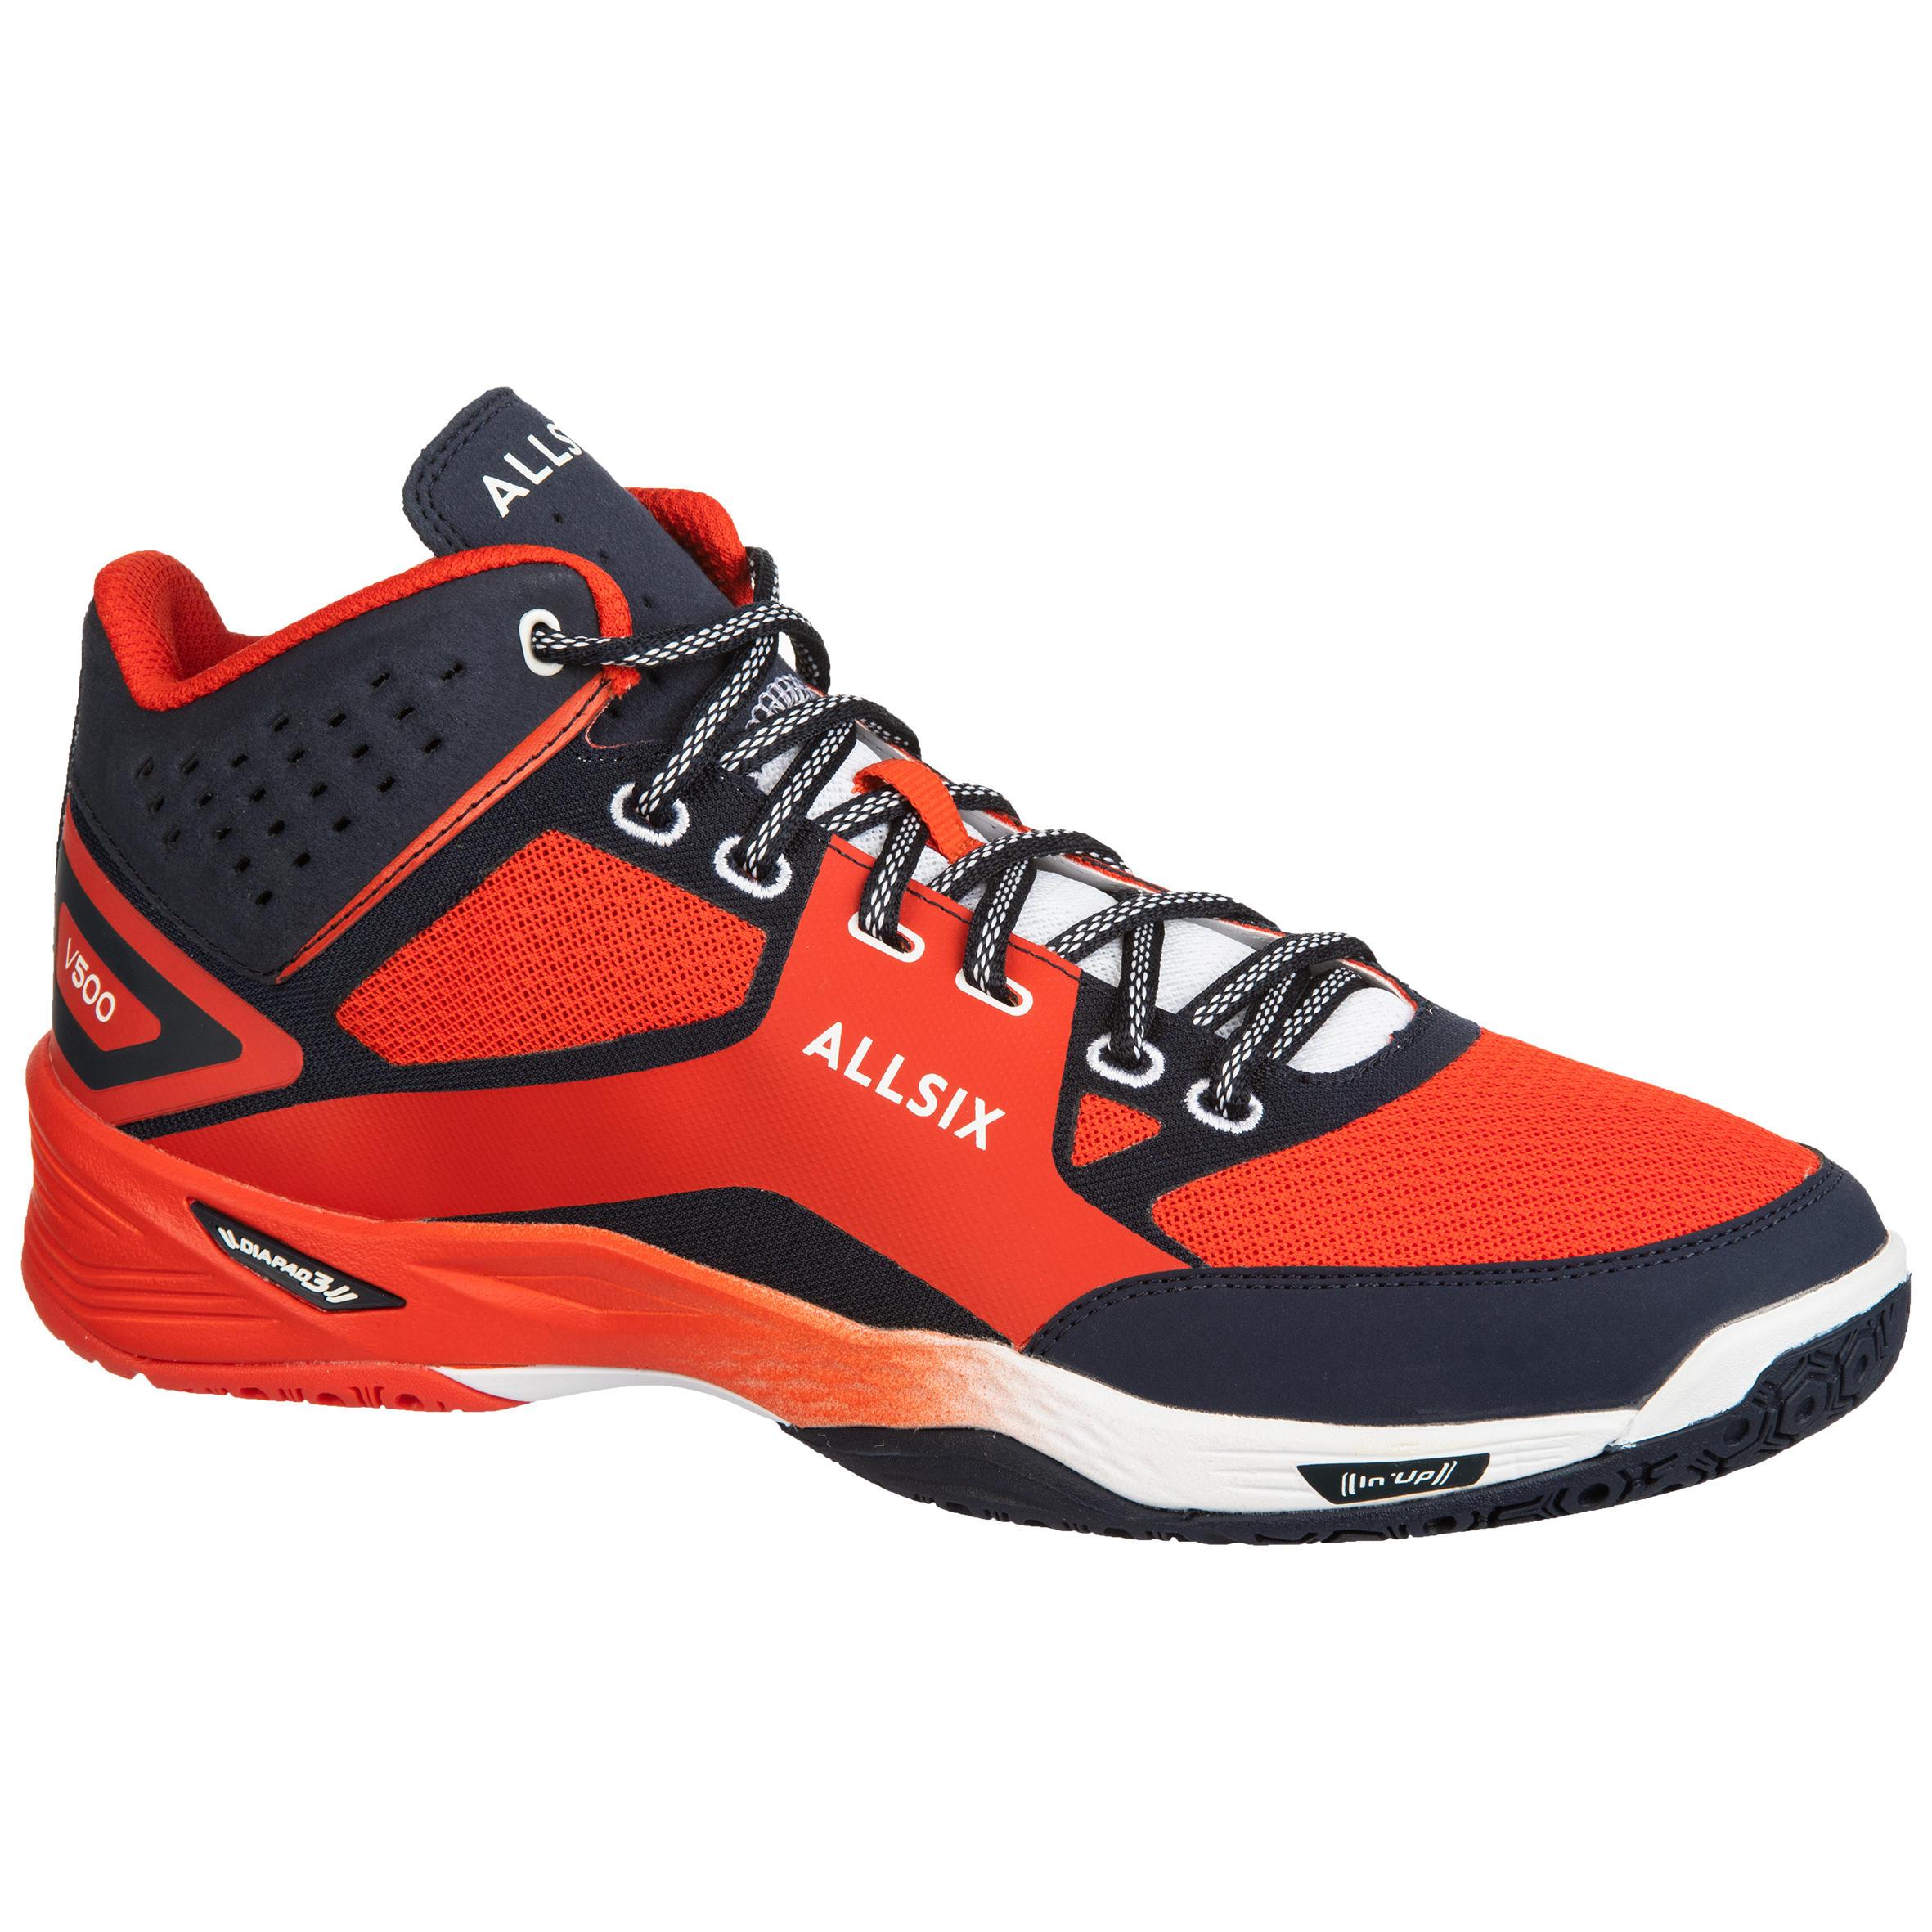 Chaussures mid homme de volley ball v500 rouges et bleues allsix